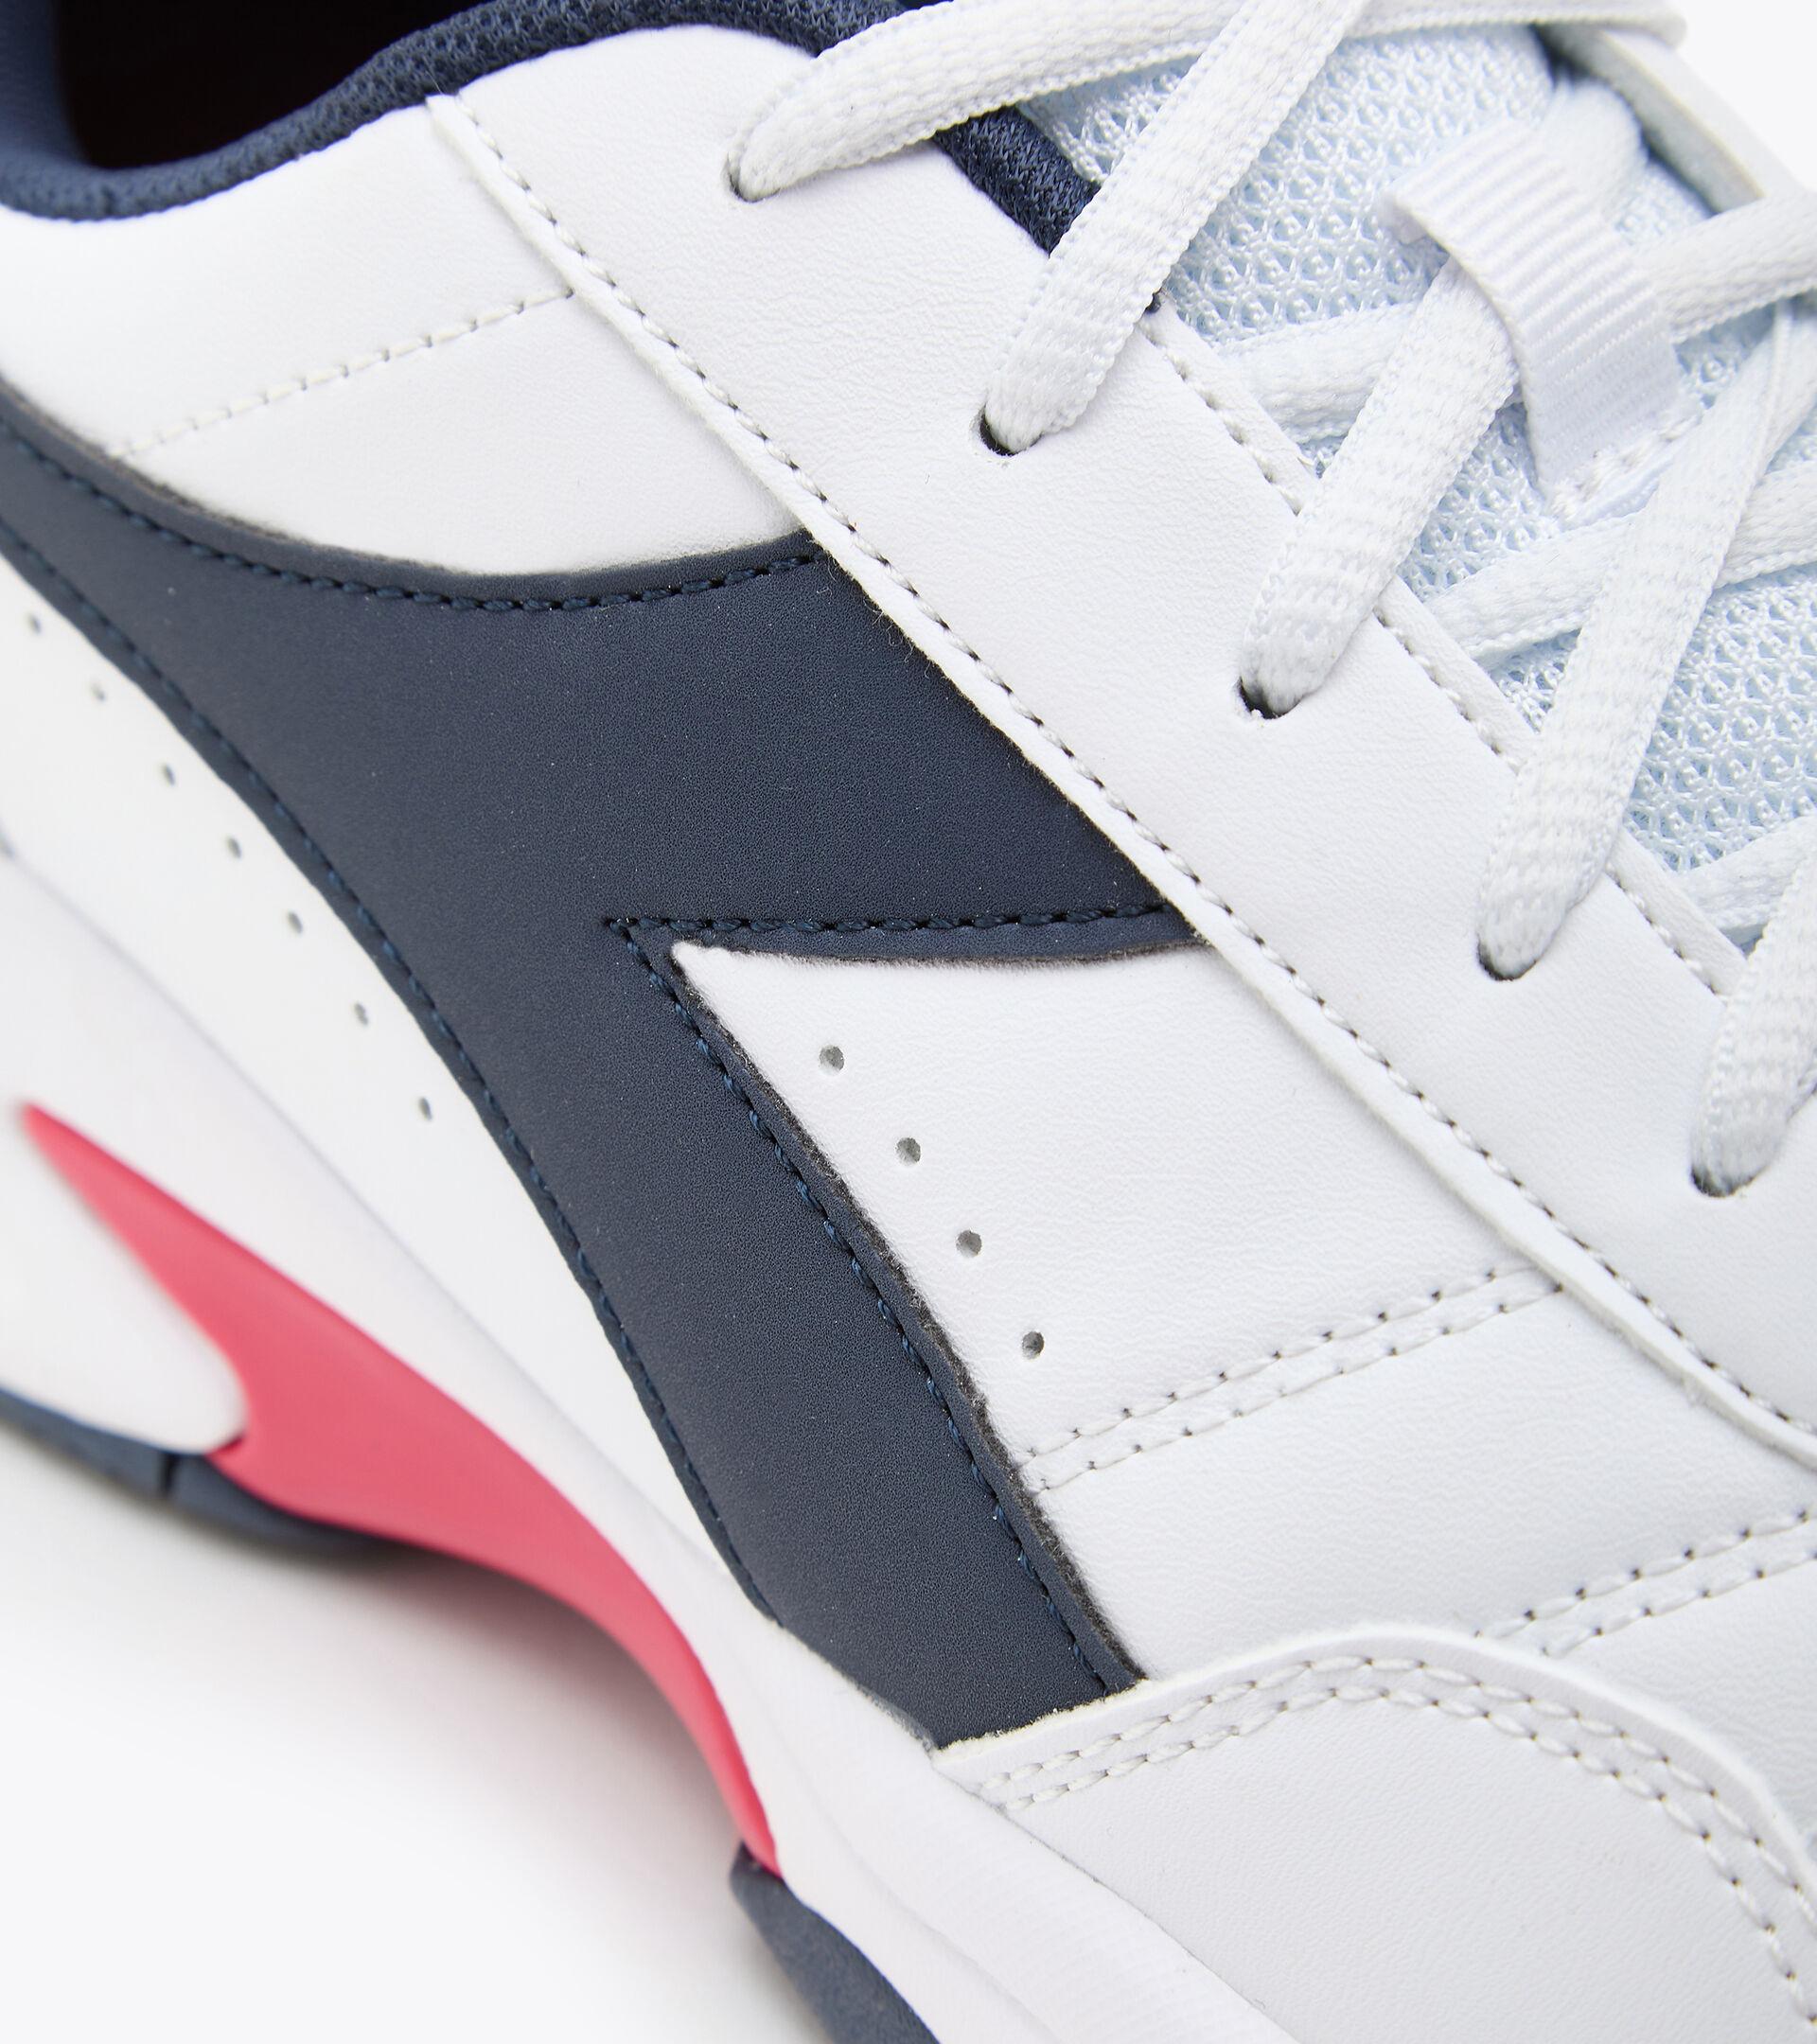 Chaussures de tennis - Homme VOLEE 4 BLANC/NOIR IRIS - Diadora